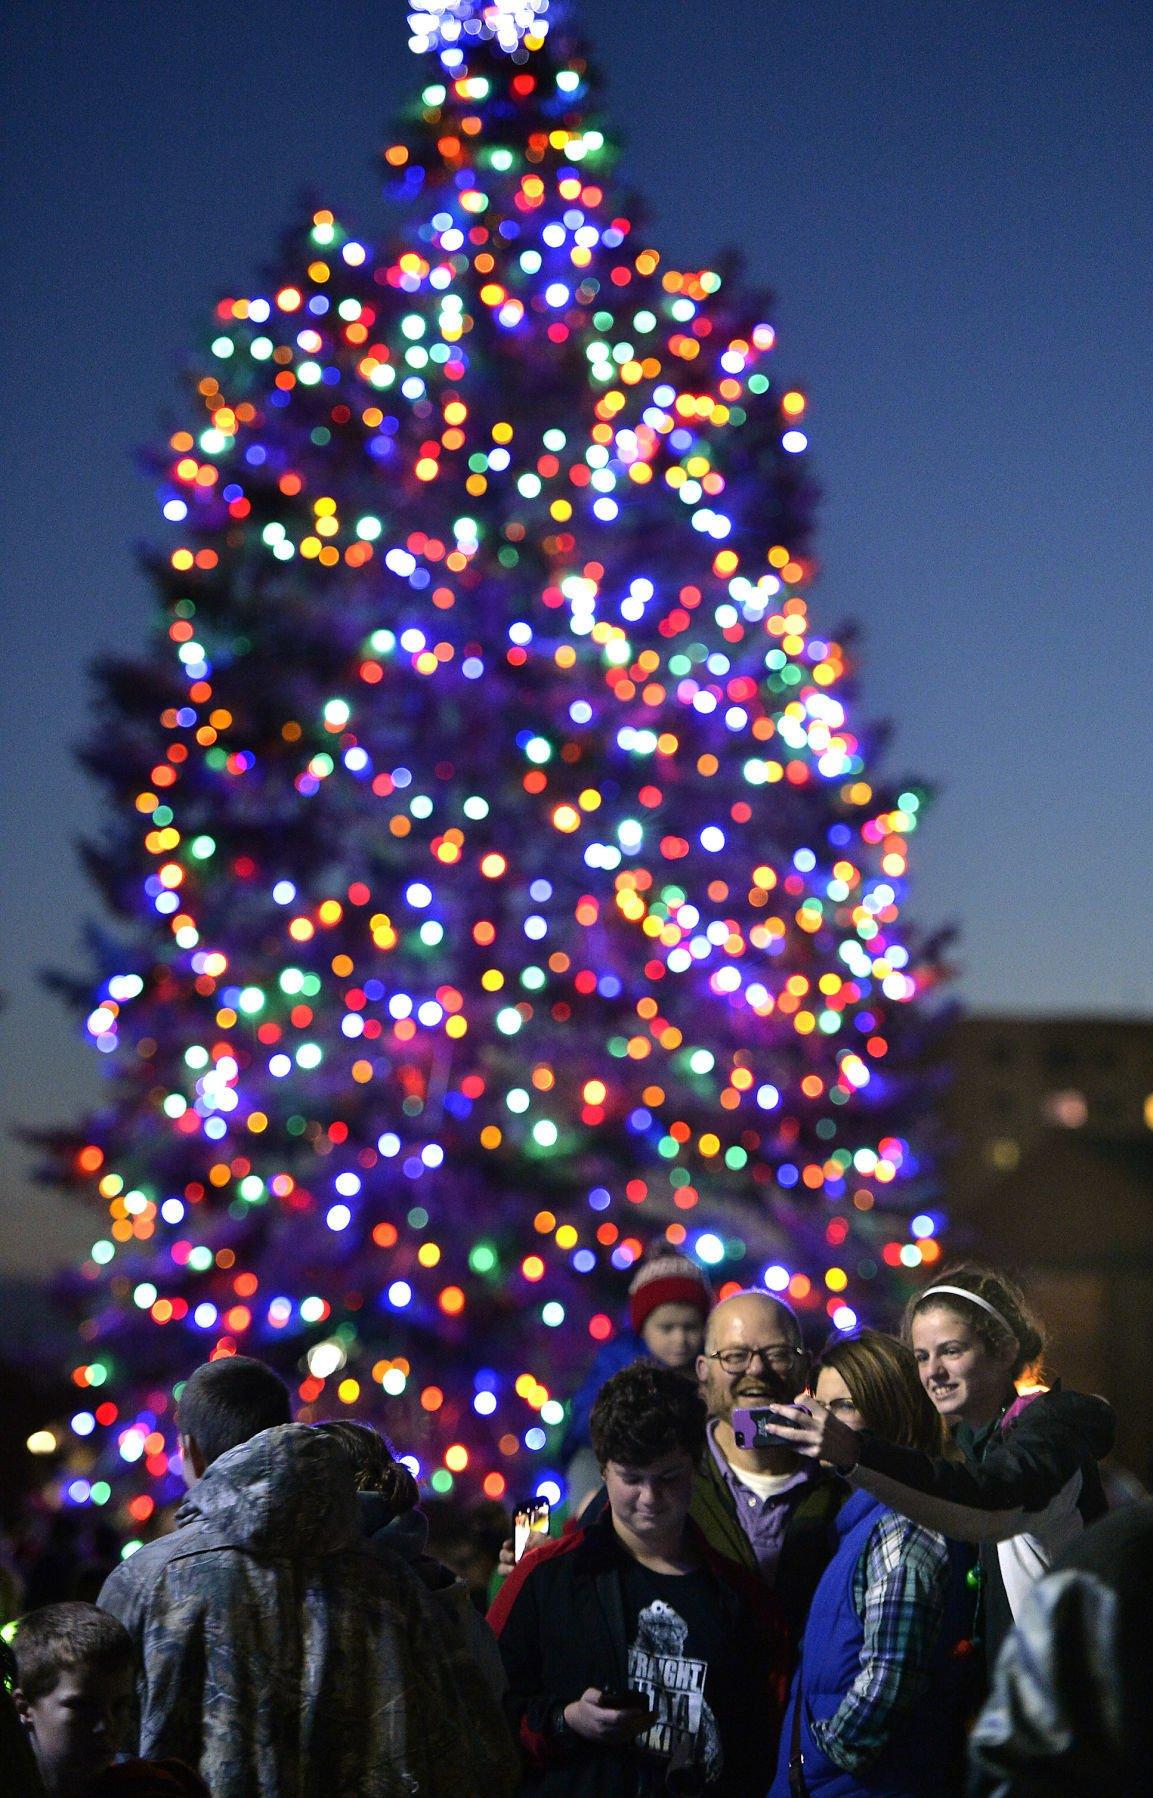 Christmas tree lighting: Thousands flock to downtown Kenosha | Local News | kenoshanews.com